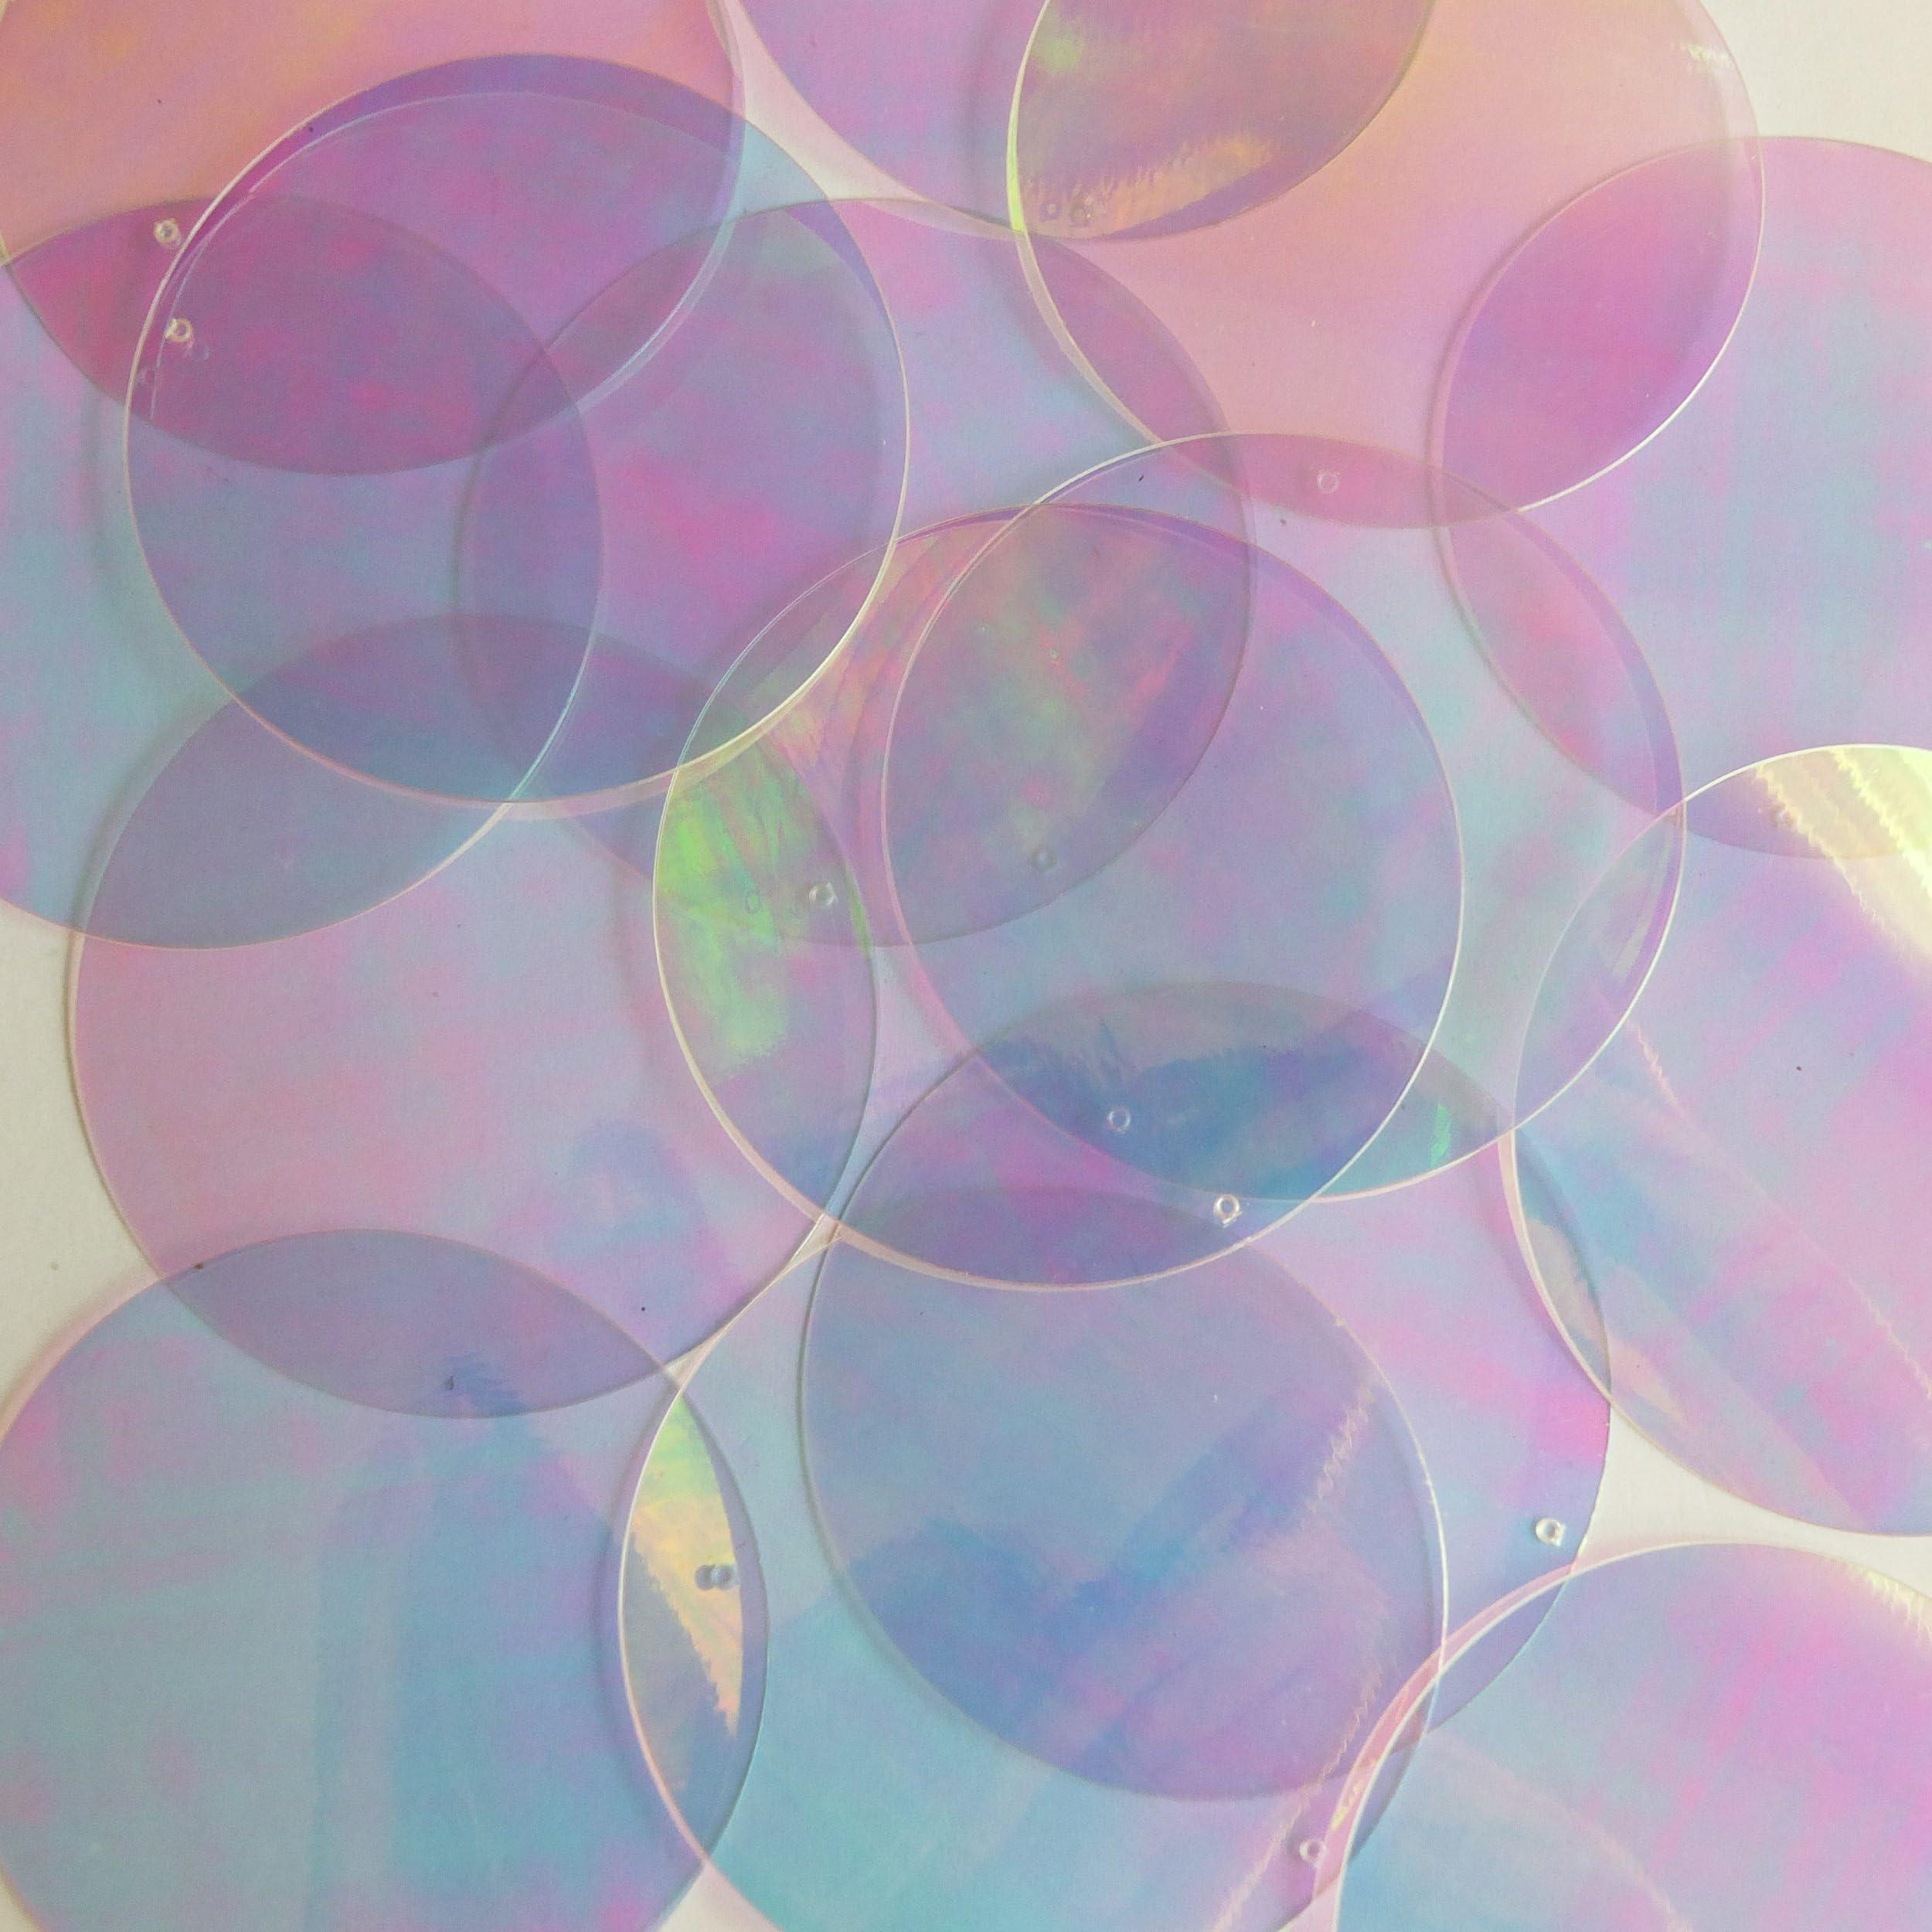 10mm Flat Sequins Premium Mirror Crystal Iridiscent Reflective